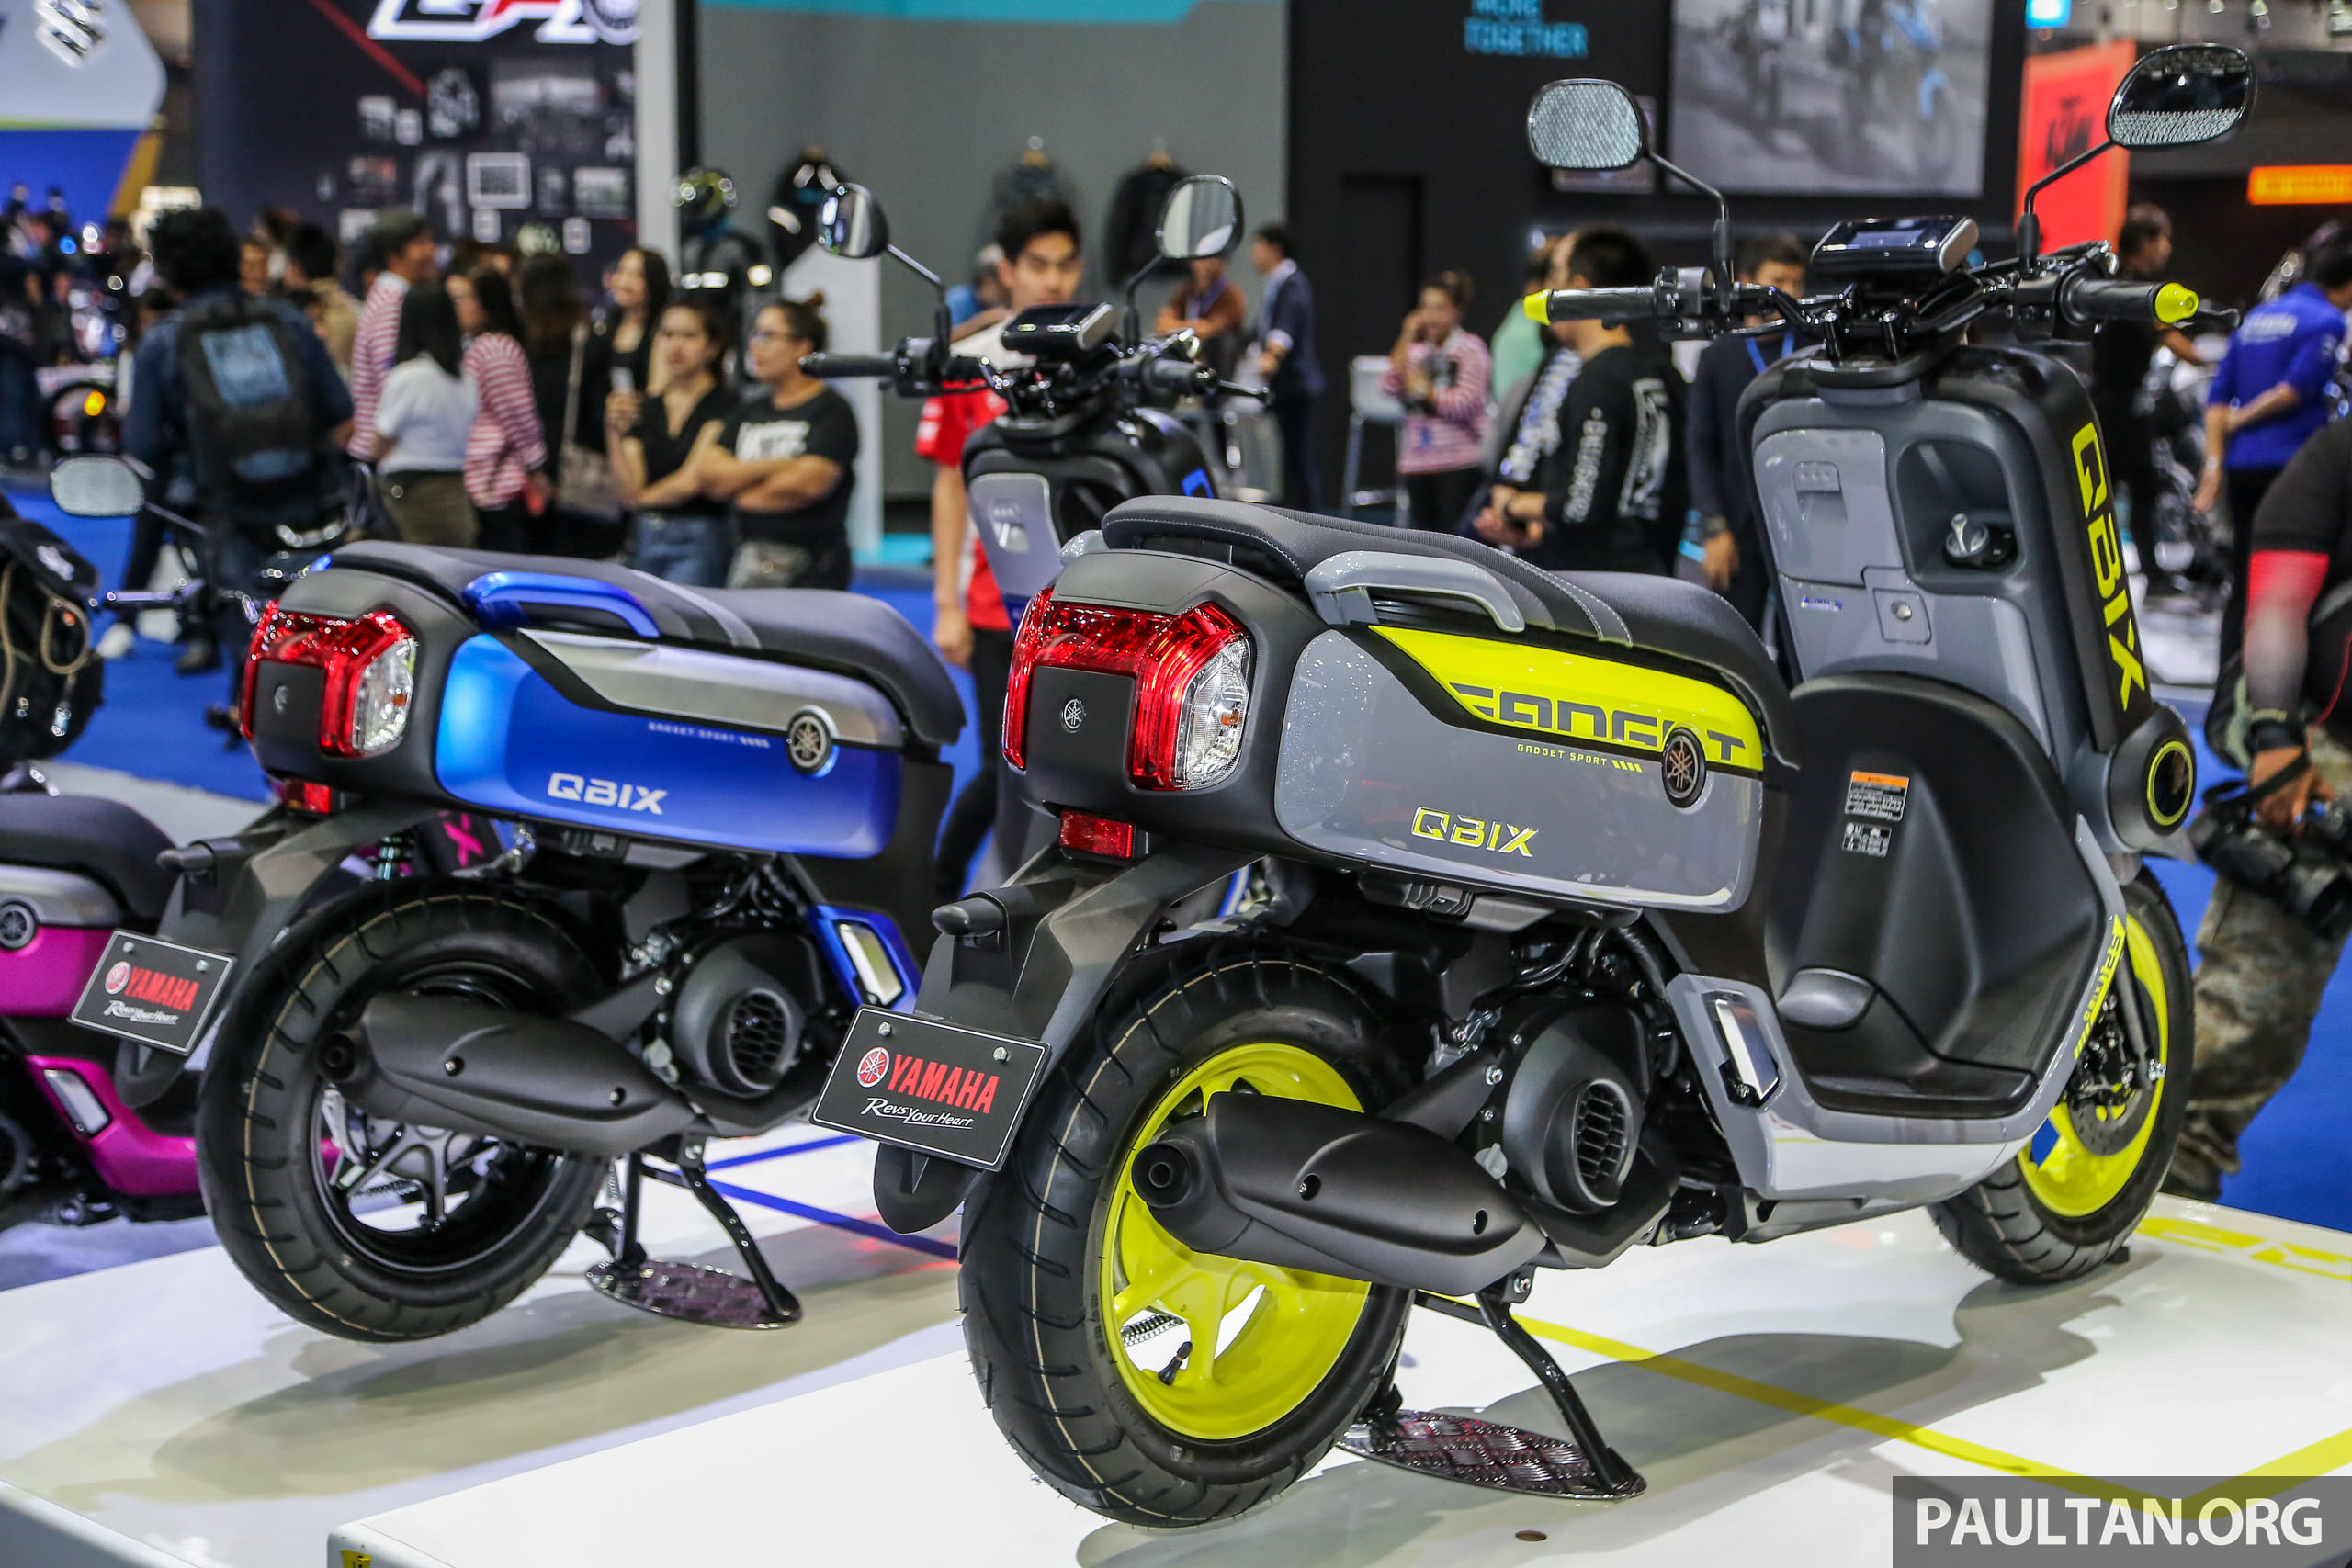 Qbix Yamaha